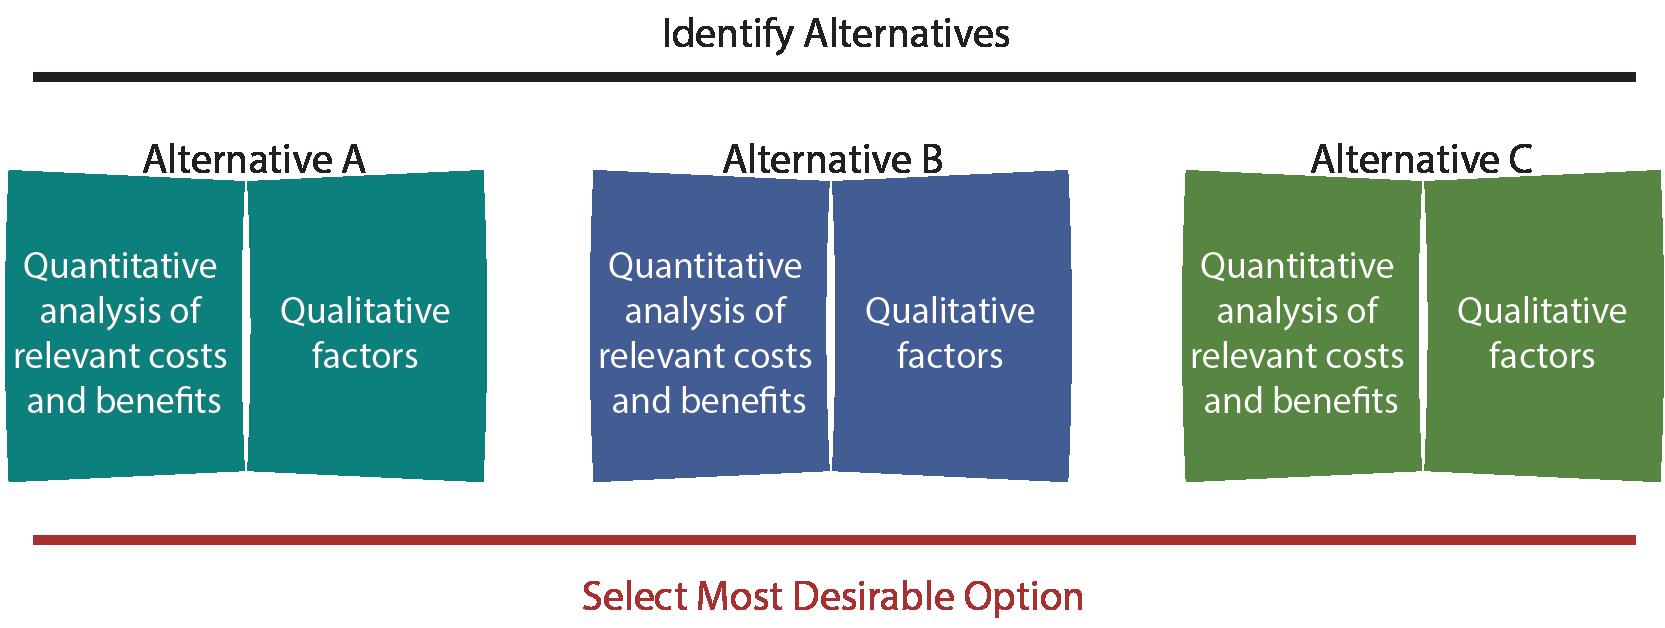 Identifying Alternatives Illustration